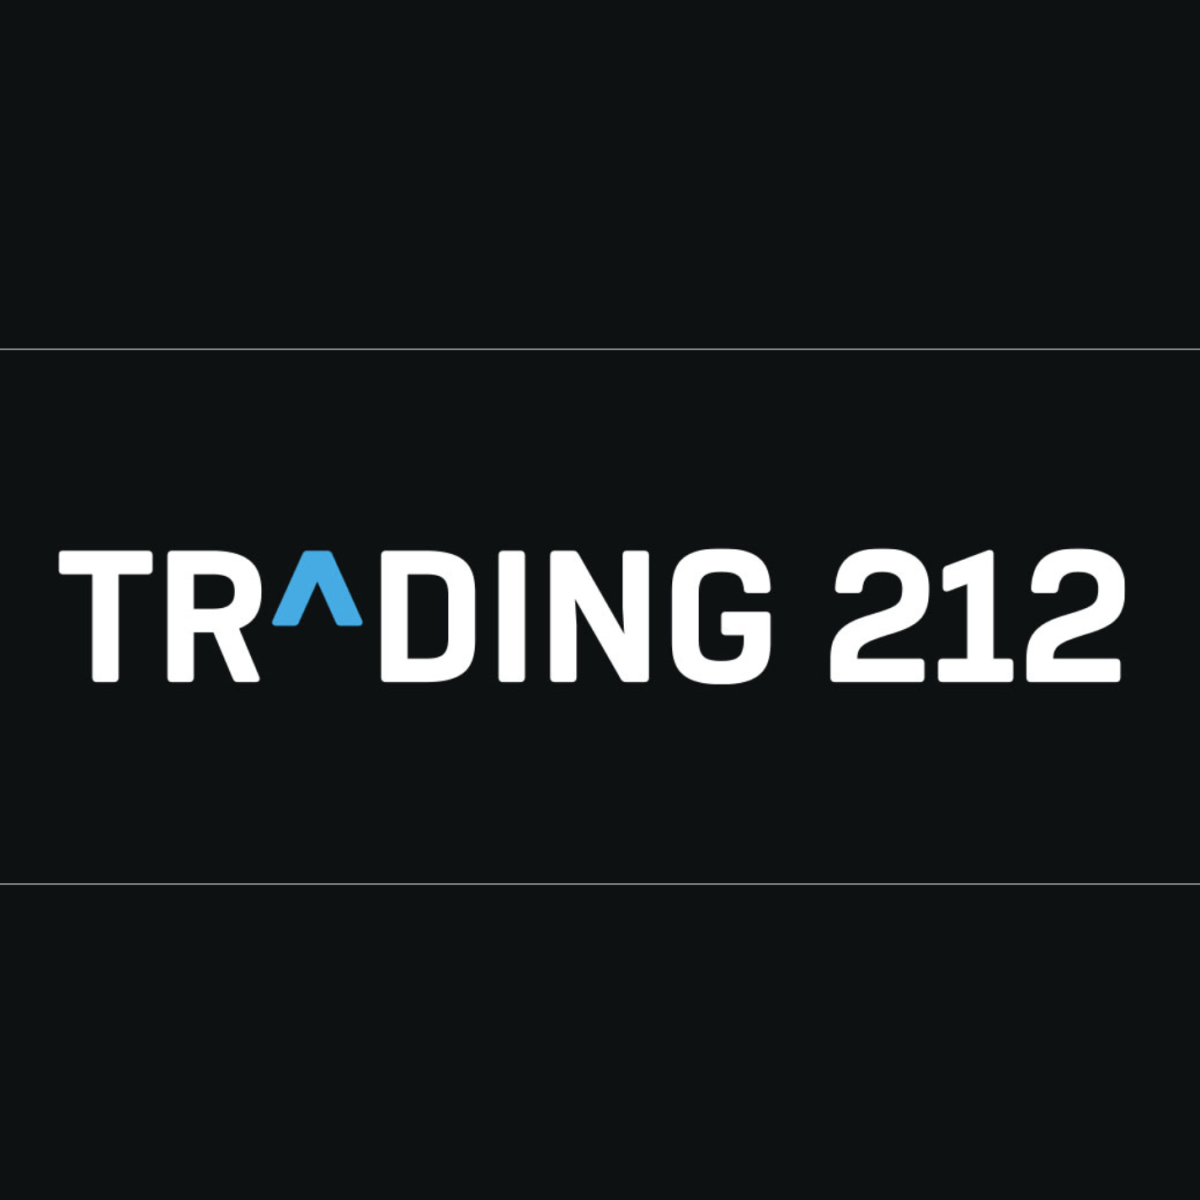 Trading 212 Logo @ Savings4Freedom